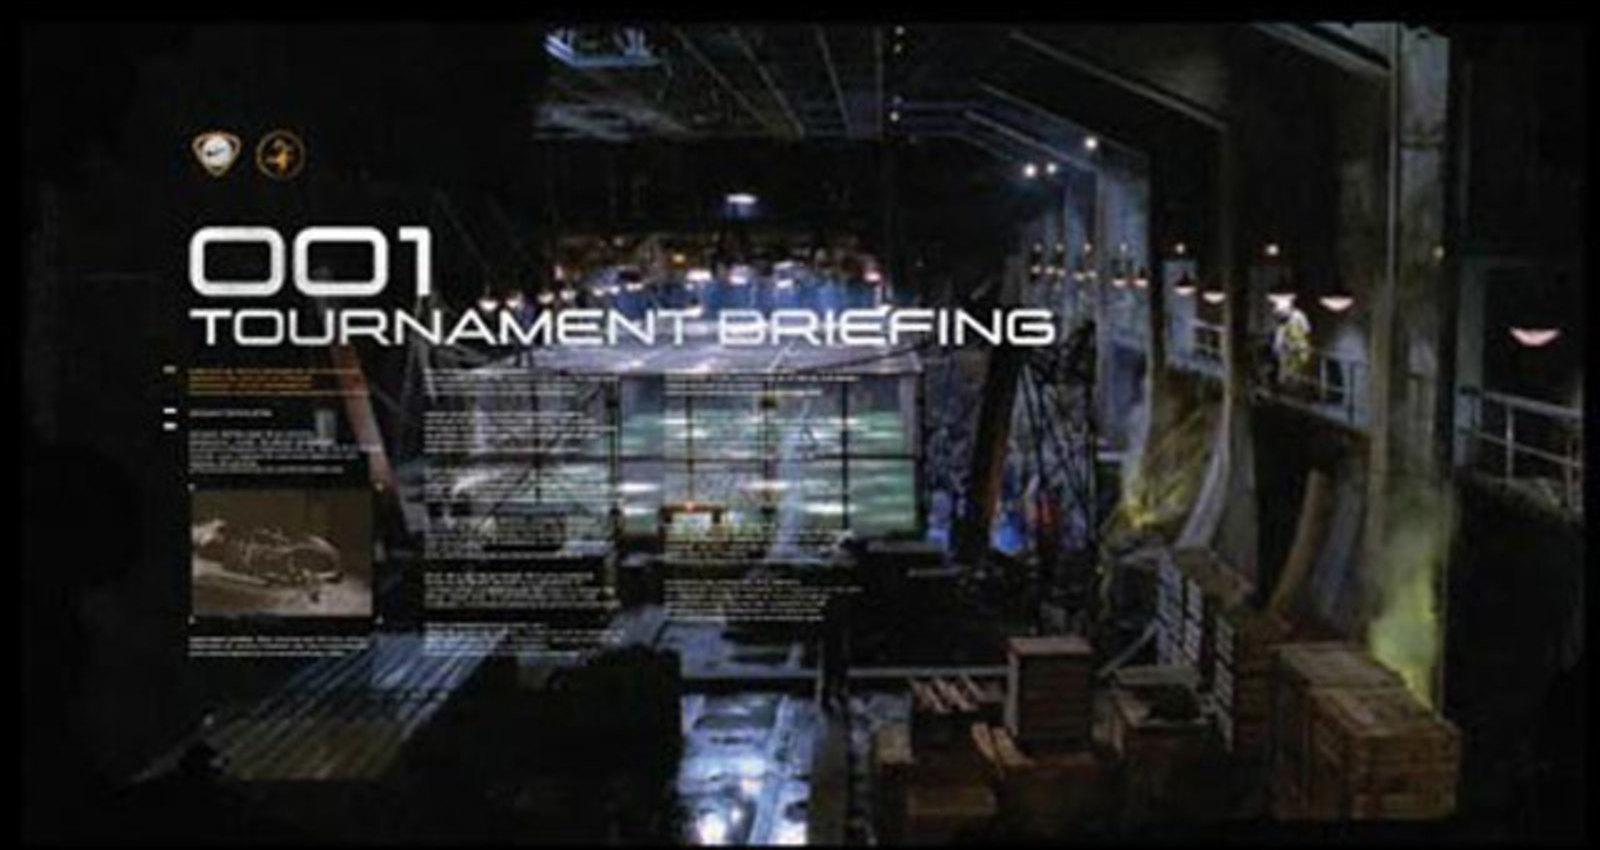 The Secret Tournament